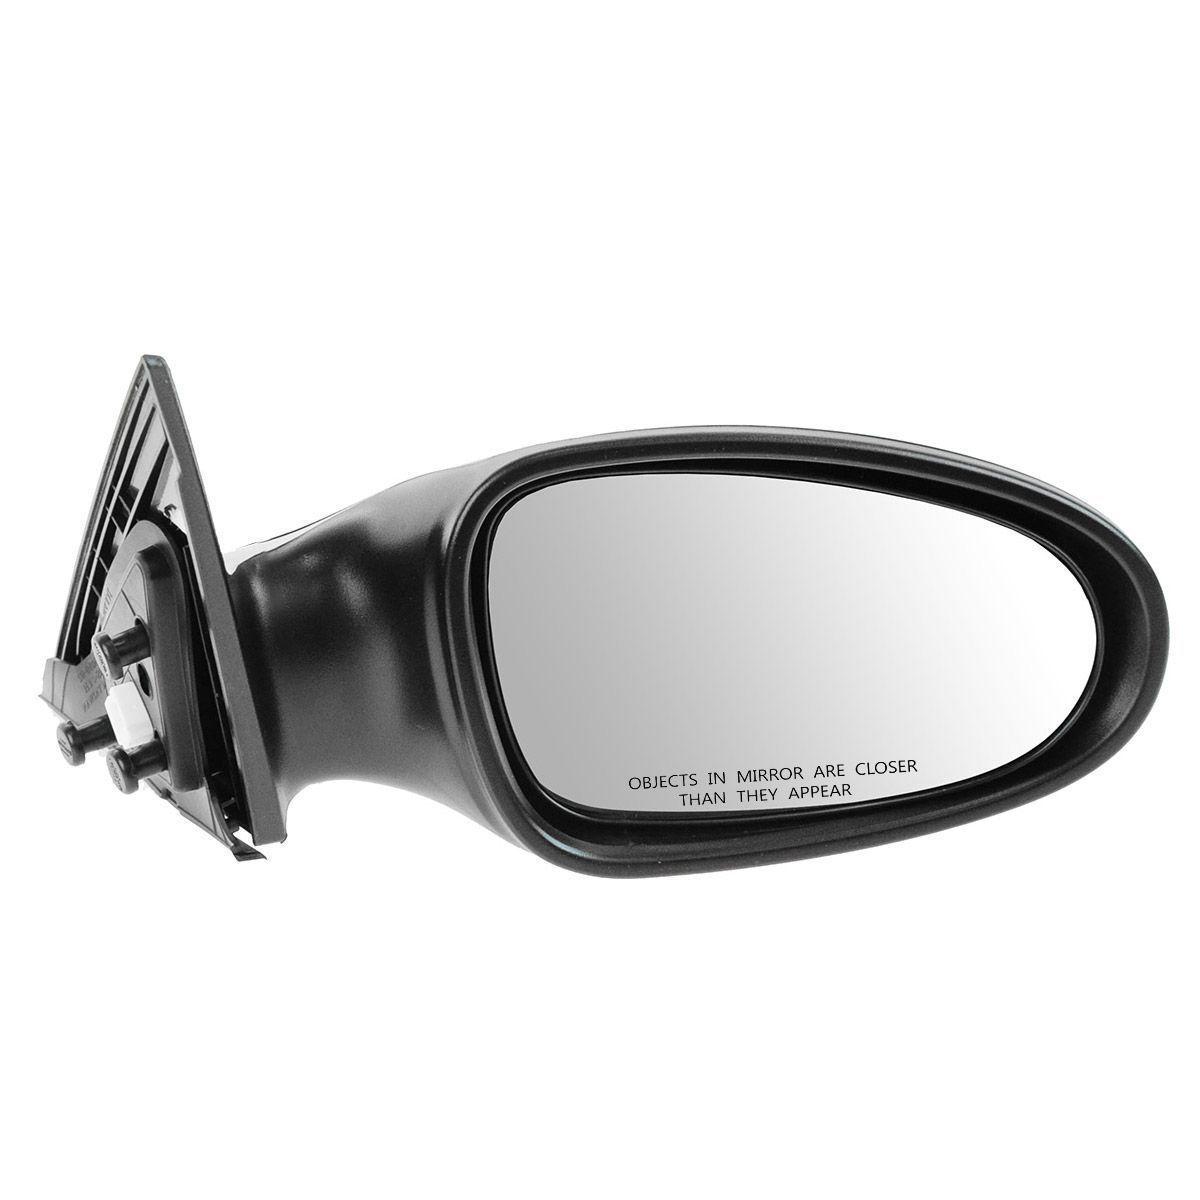 USミラー 02-04日産アルティマの新型パッセンジャーパワーサイドミラー New Passenger Power Side Mirror for a 02-04 Nissan Altima w/Lifetime Warranty